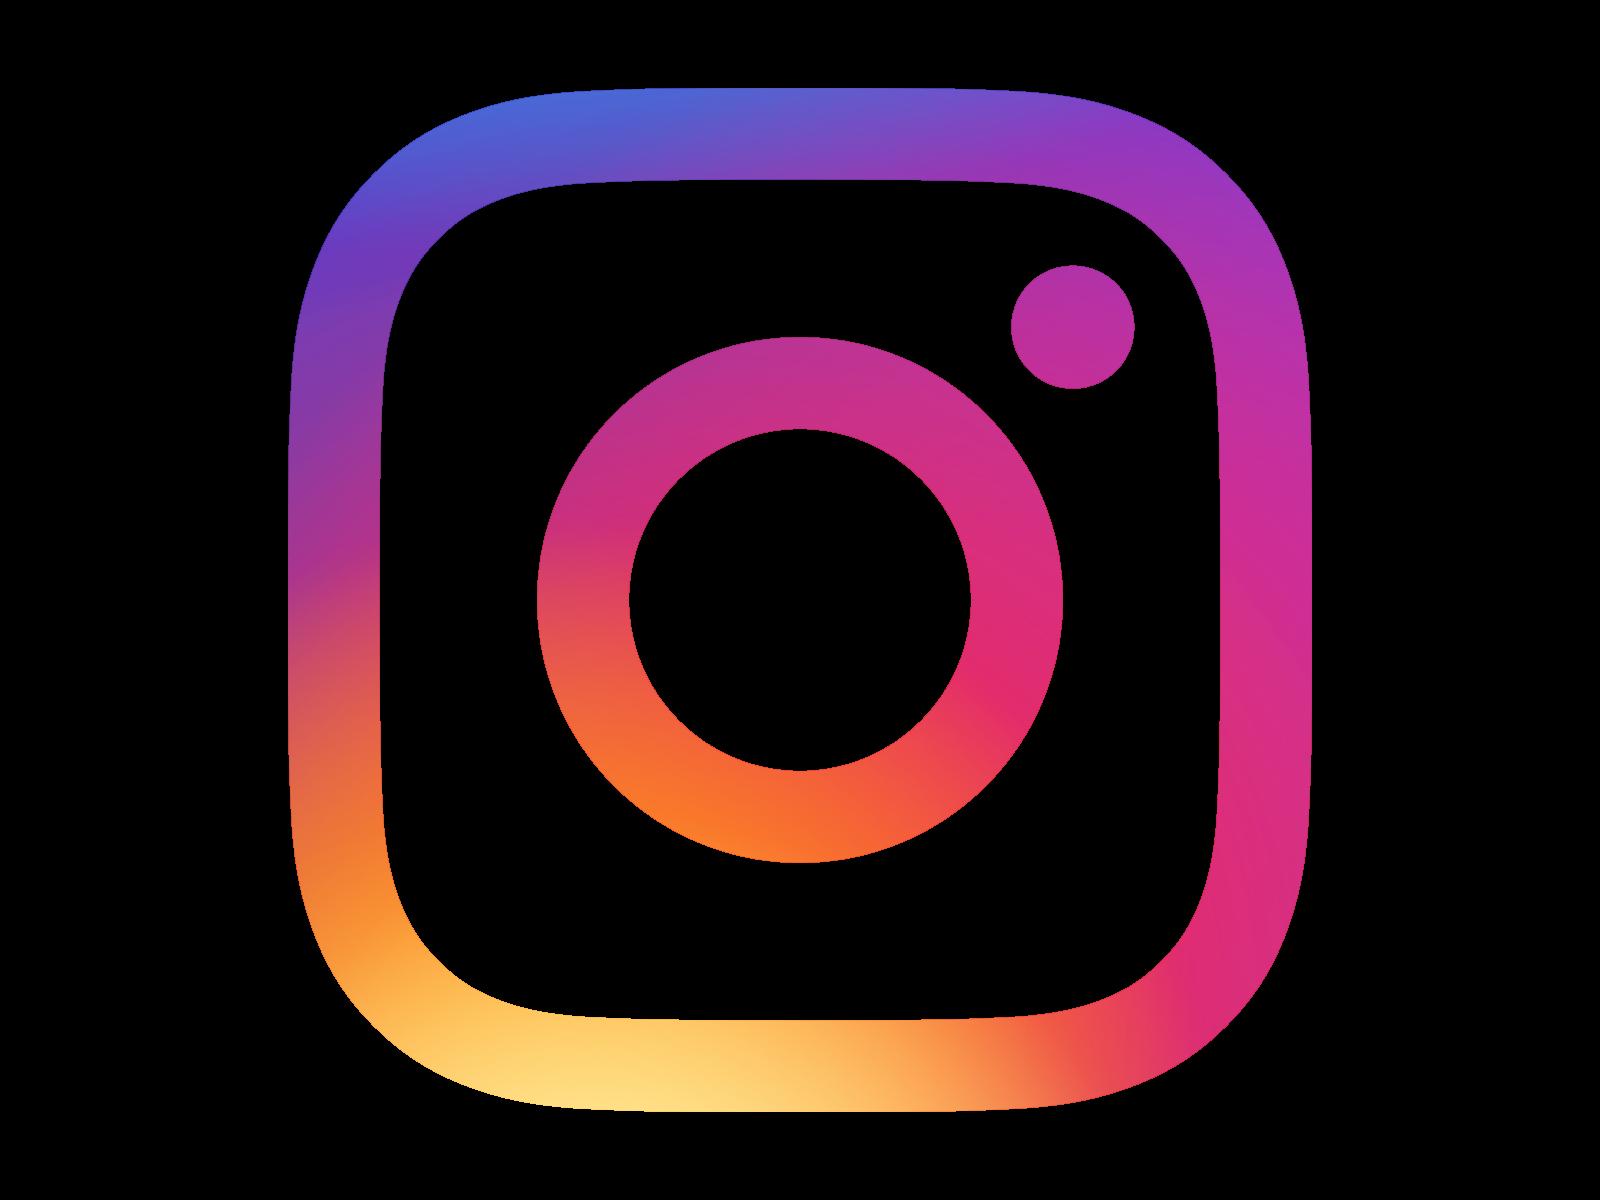 T&R Recordings Artist: Beau Instagram